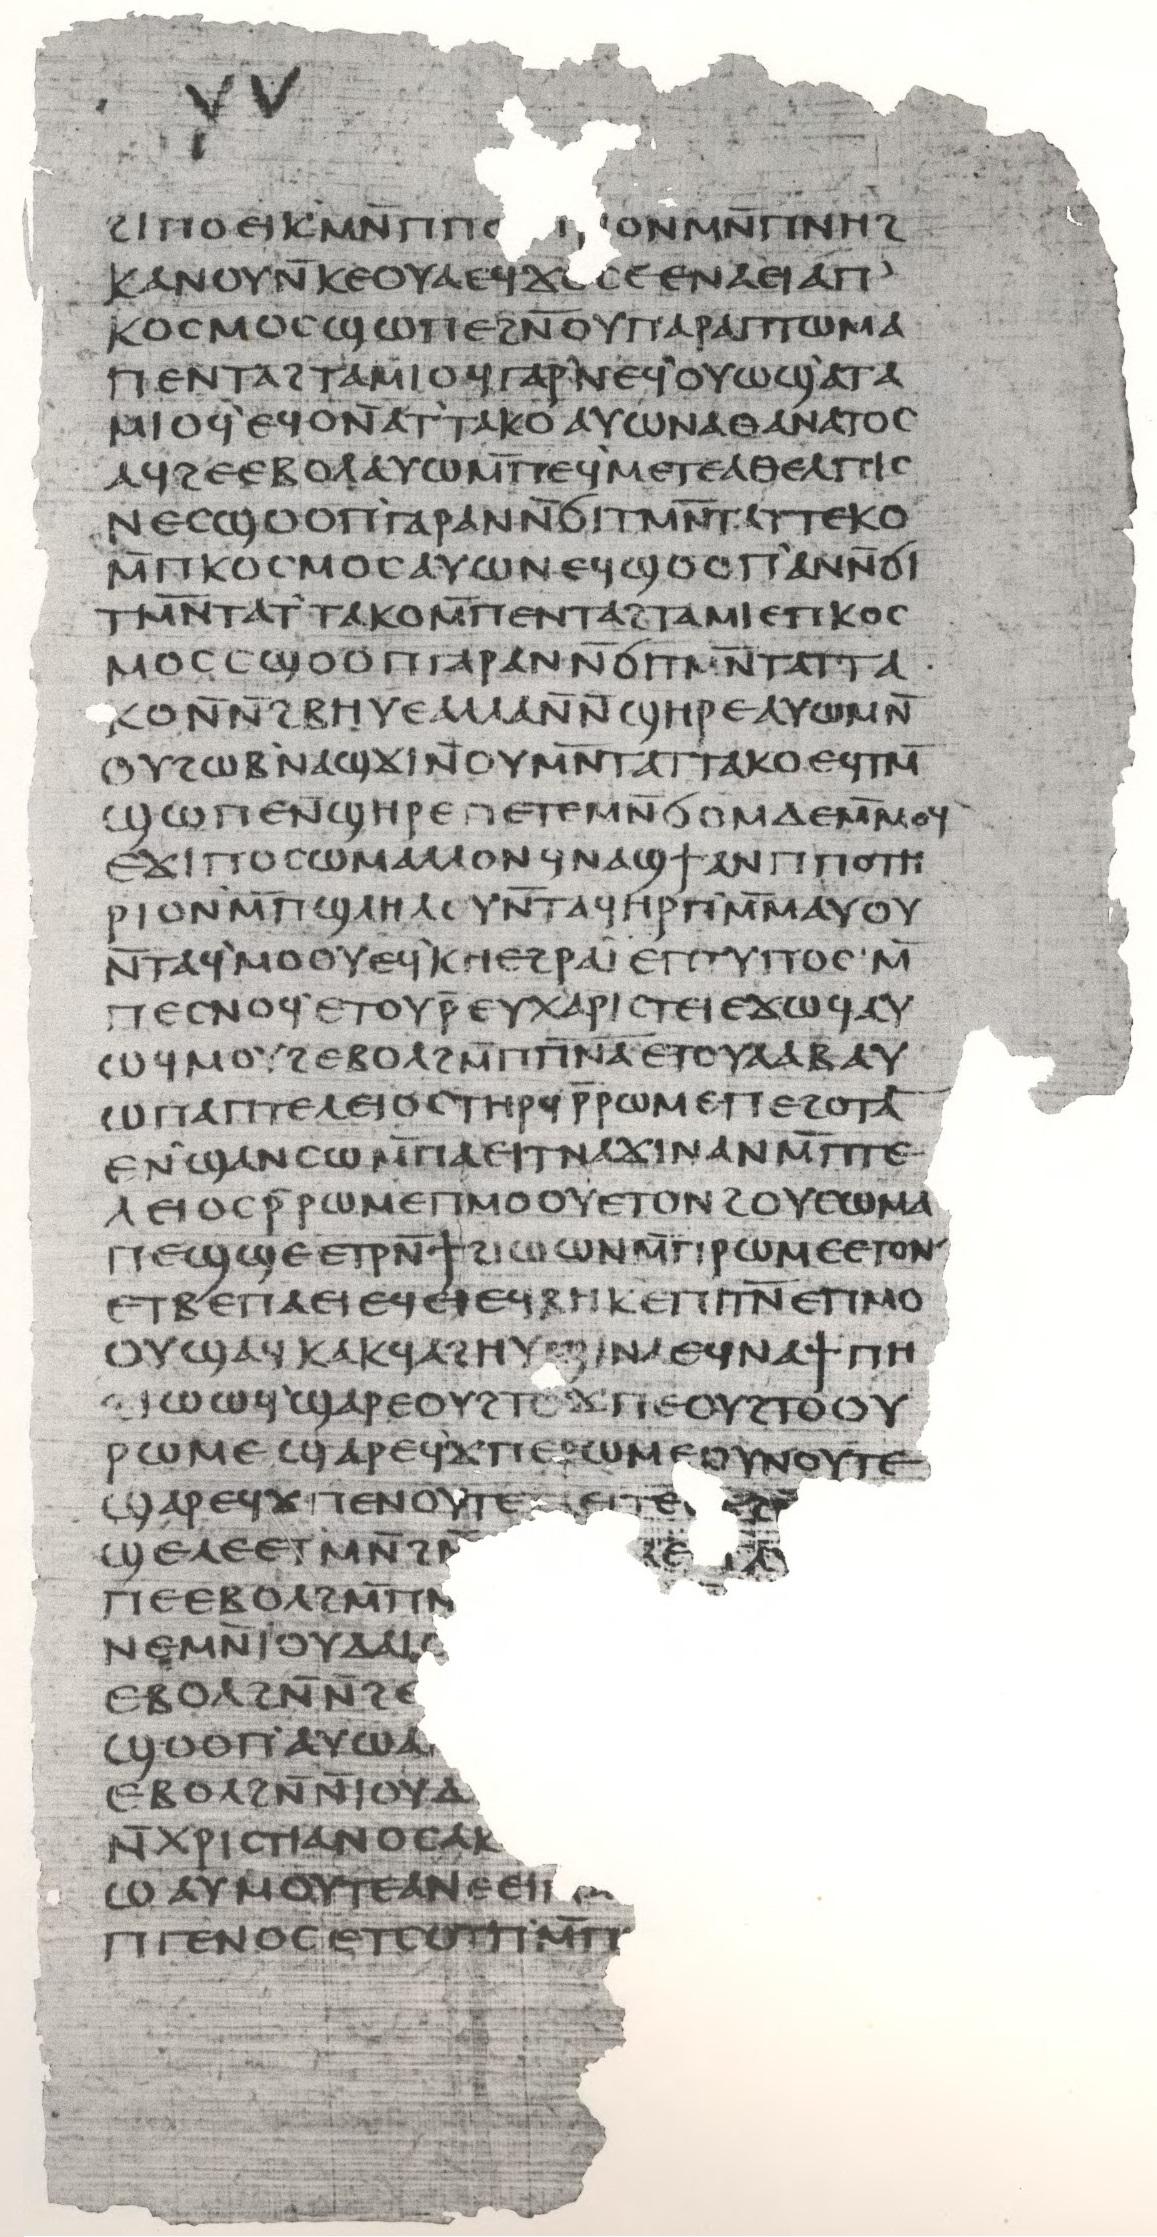 Gospel_of_Philip_facsimile_Page_75.jpg